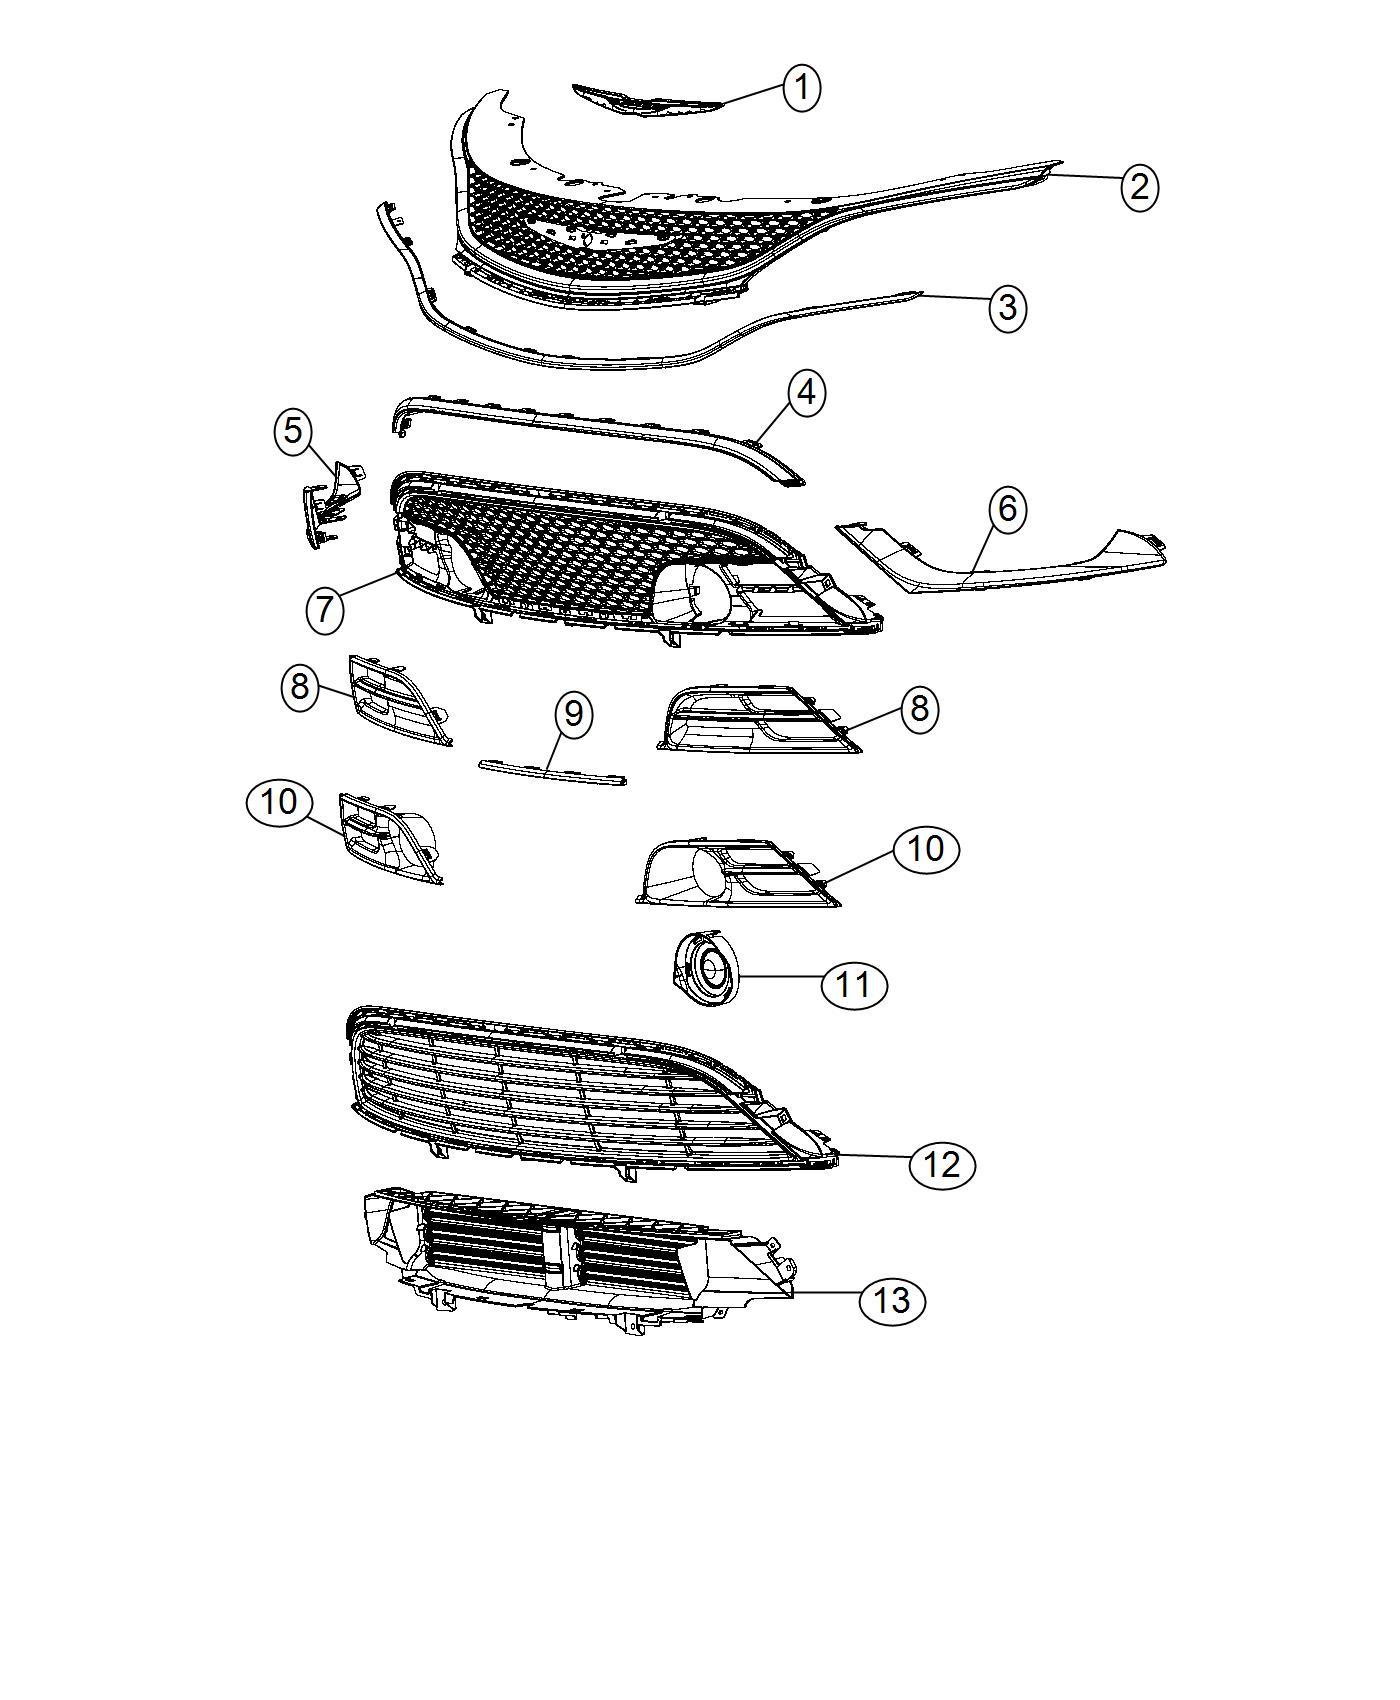 Chrysler 200 Grille. Active shutter. Fascias, shutters